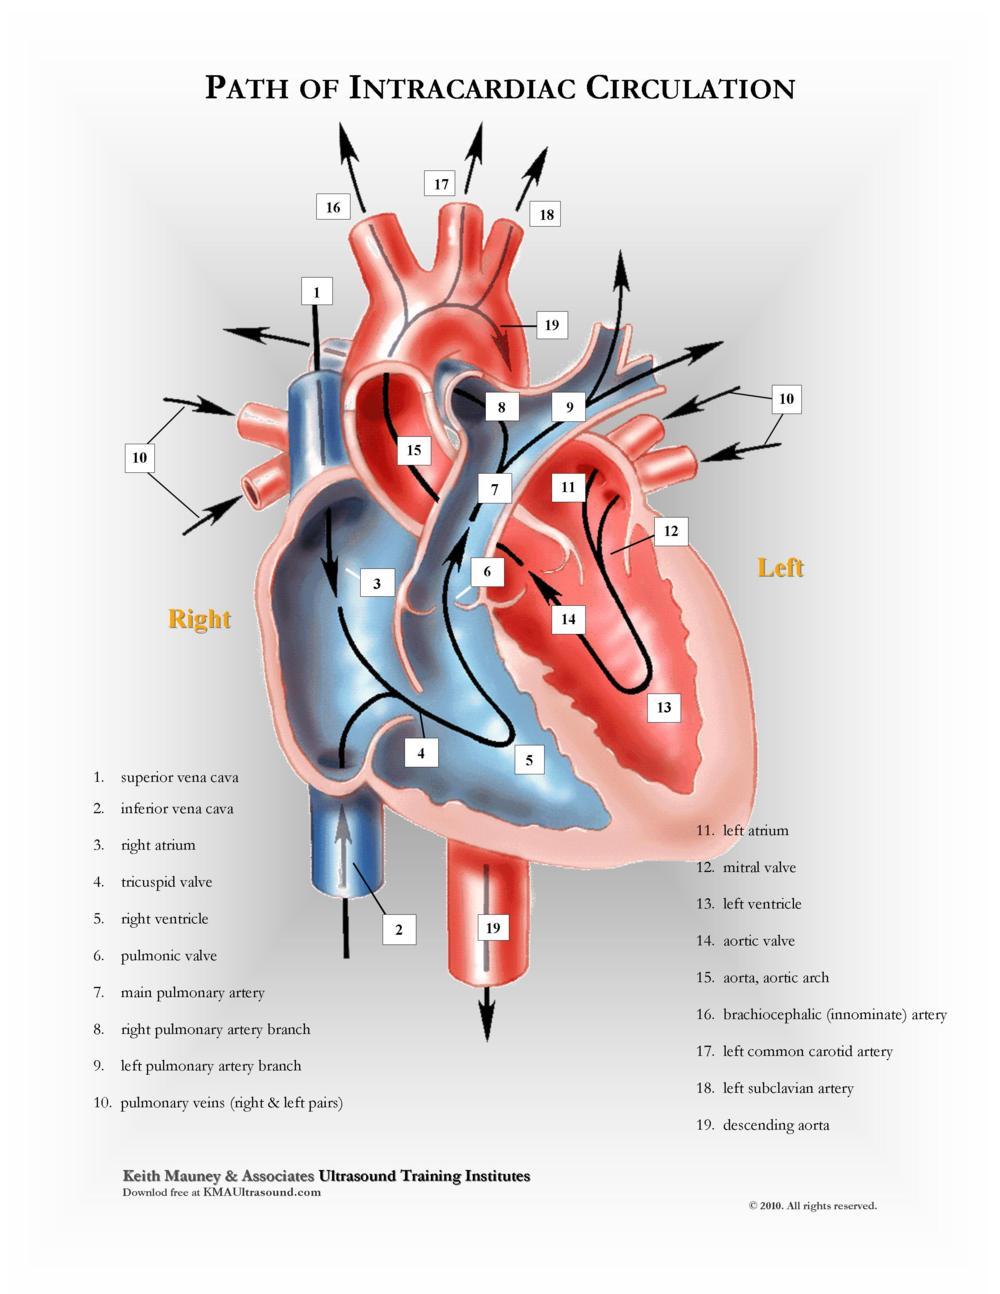 KMA Ultrasound Path of Intracardiac Circulation